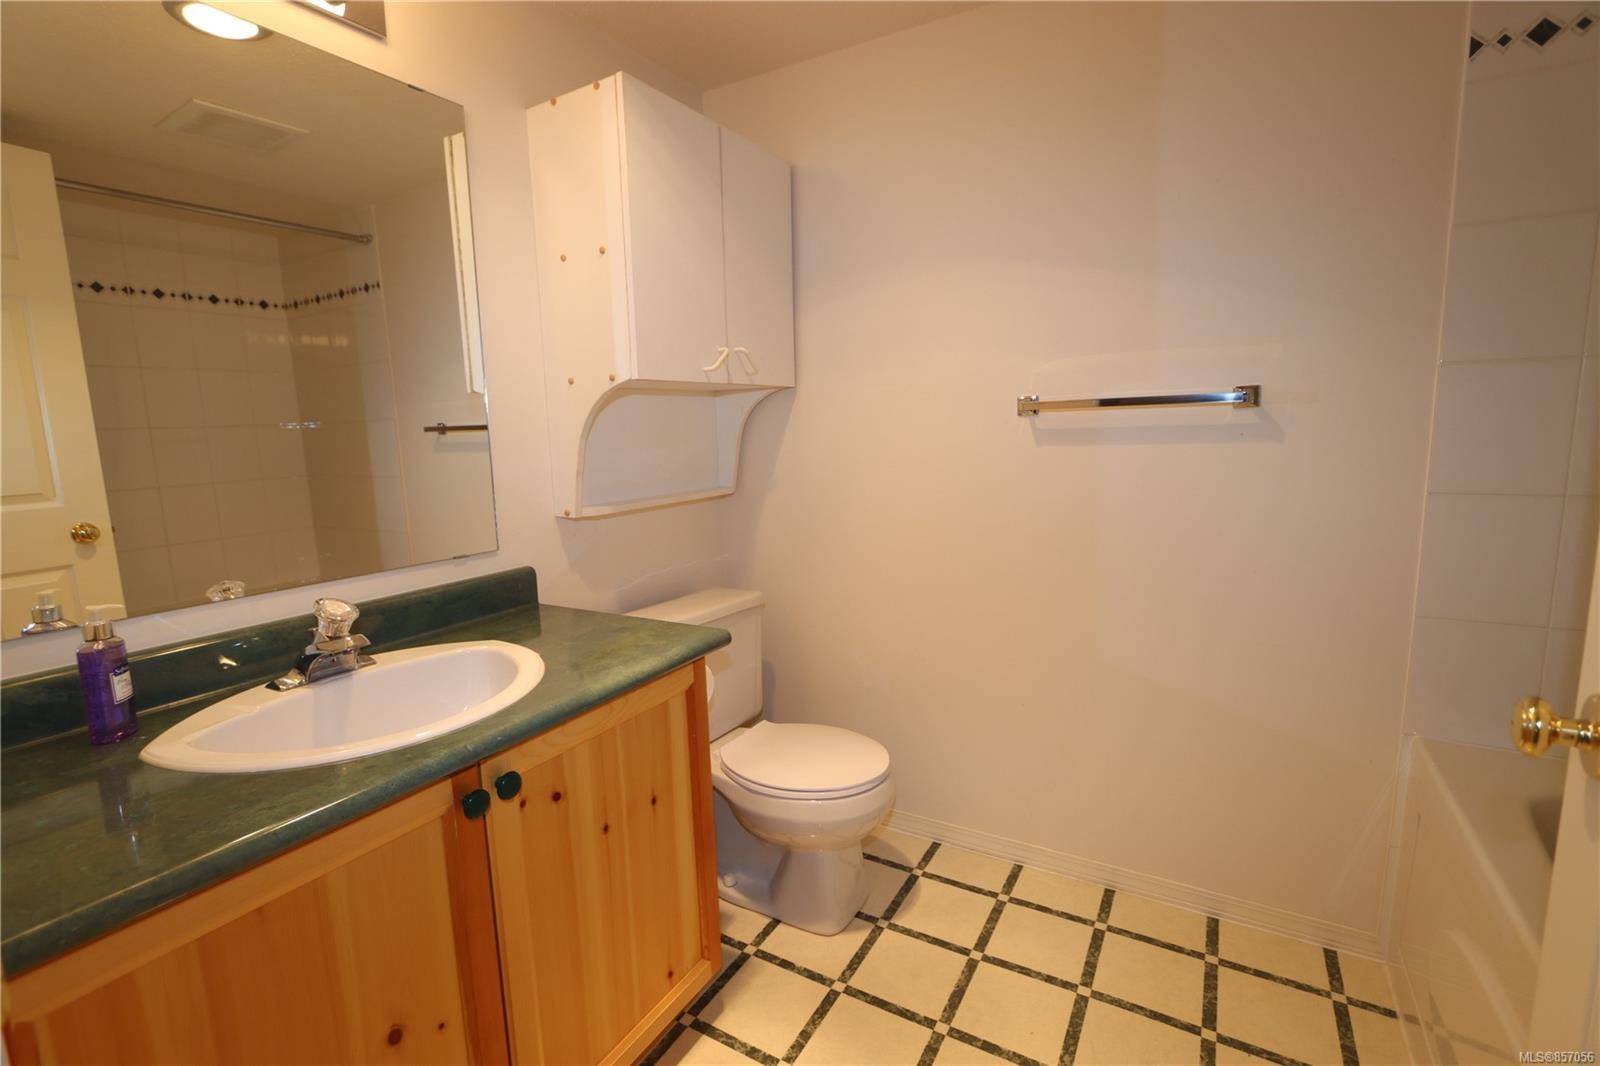 Photo 19: Photos: 118 1320 Henry Rd in : CV Mt Washington Condo for sale (Comox Valley)  : MLS®# 857056